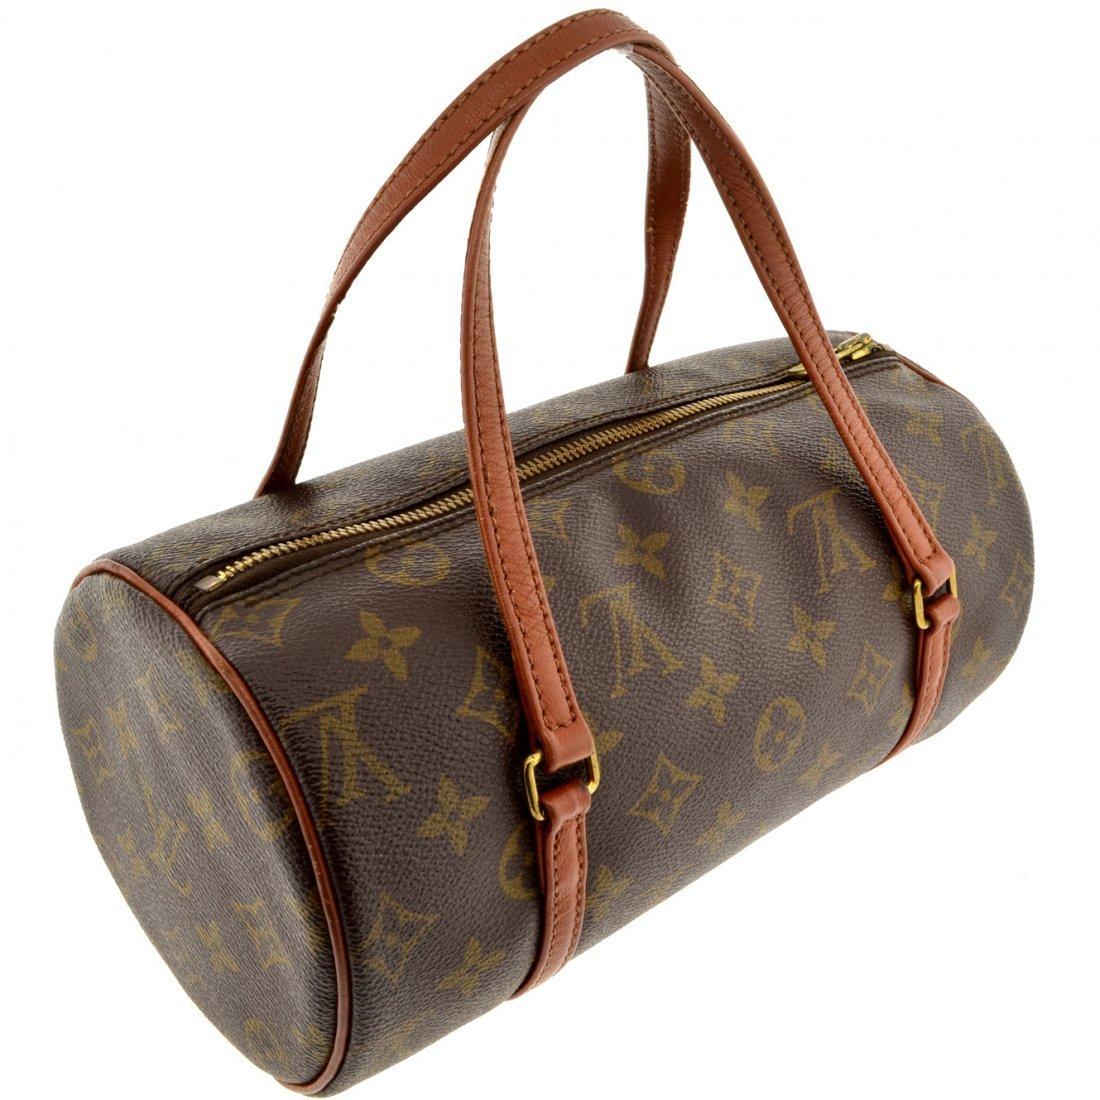 Authentic Louis Vuitton Monogram Hand Bag